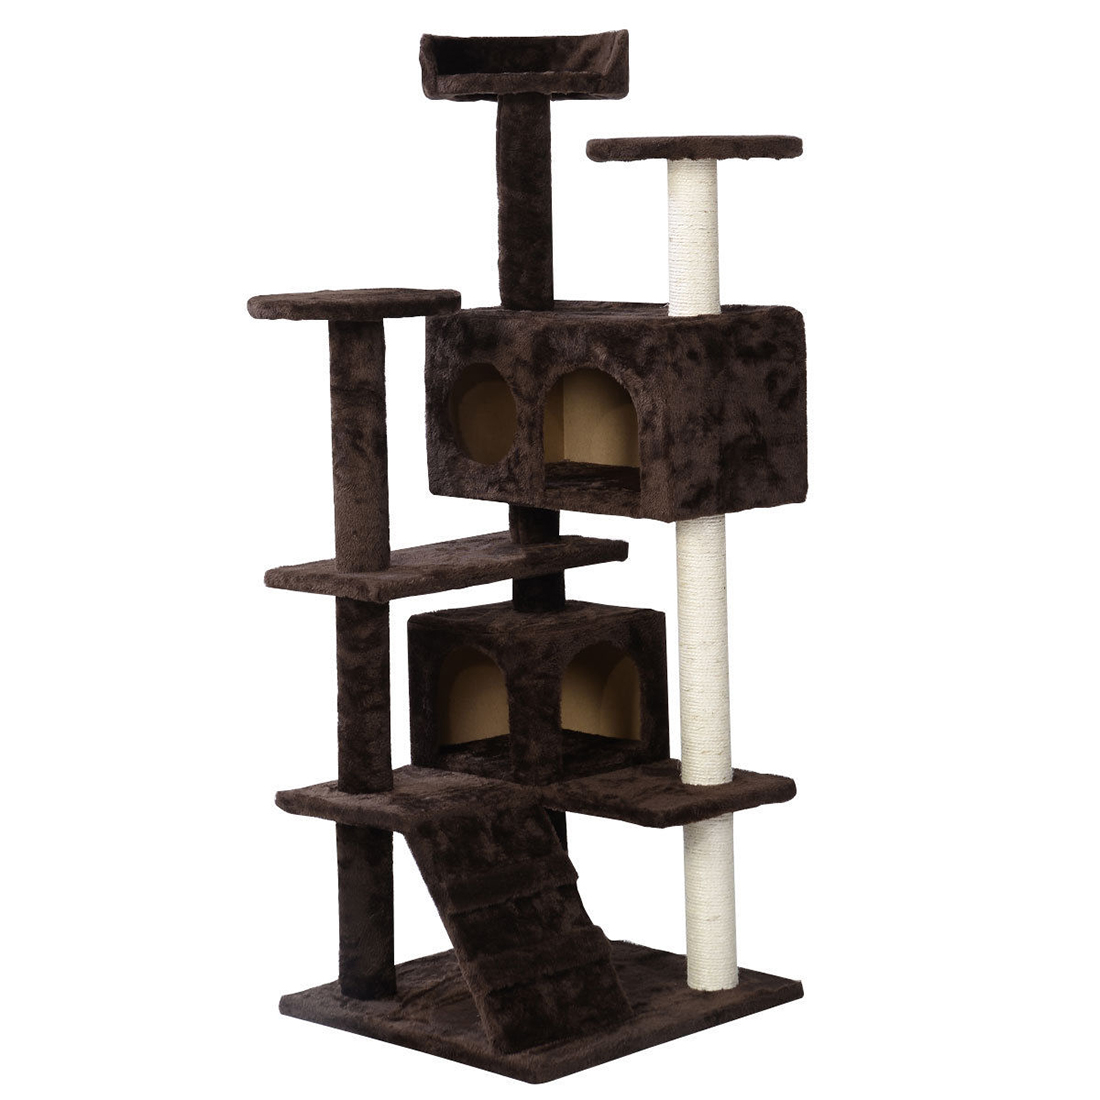 phfu 200cm cat tree scratcher scratching kitten climb post. Black Bedroom Furniture Sets. Home Design Ideas